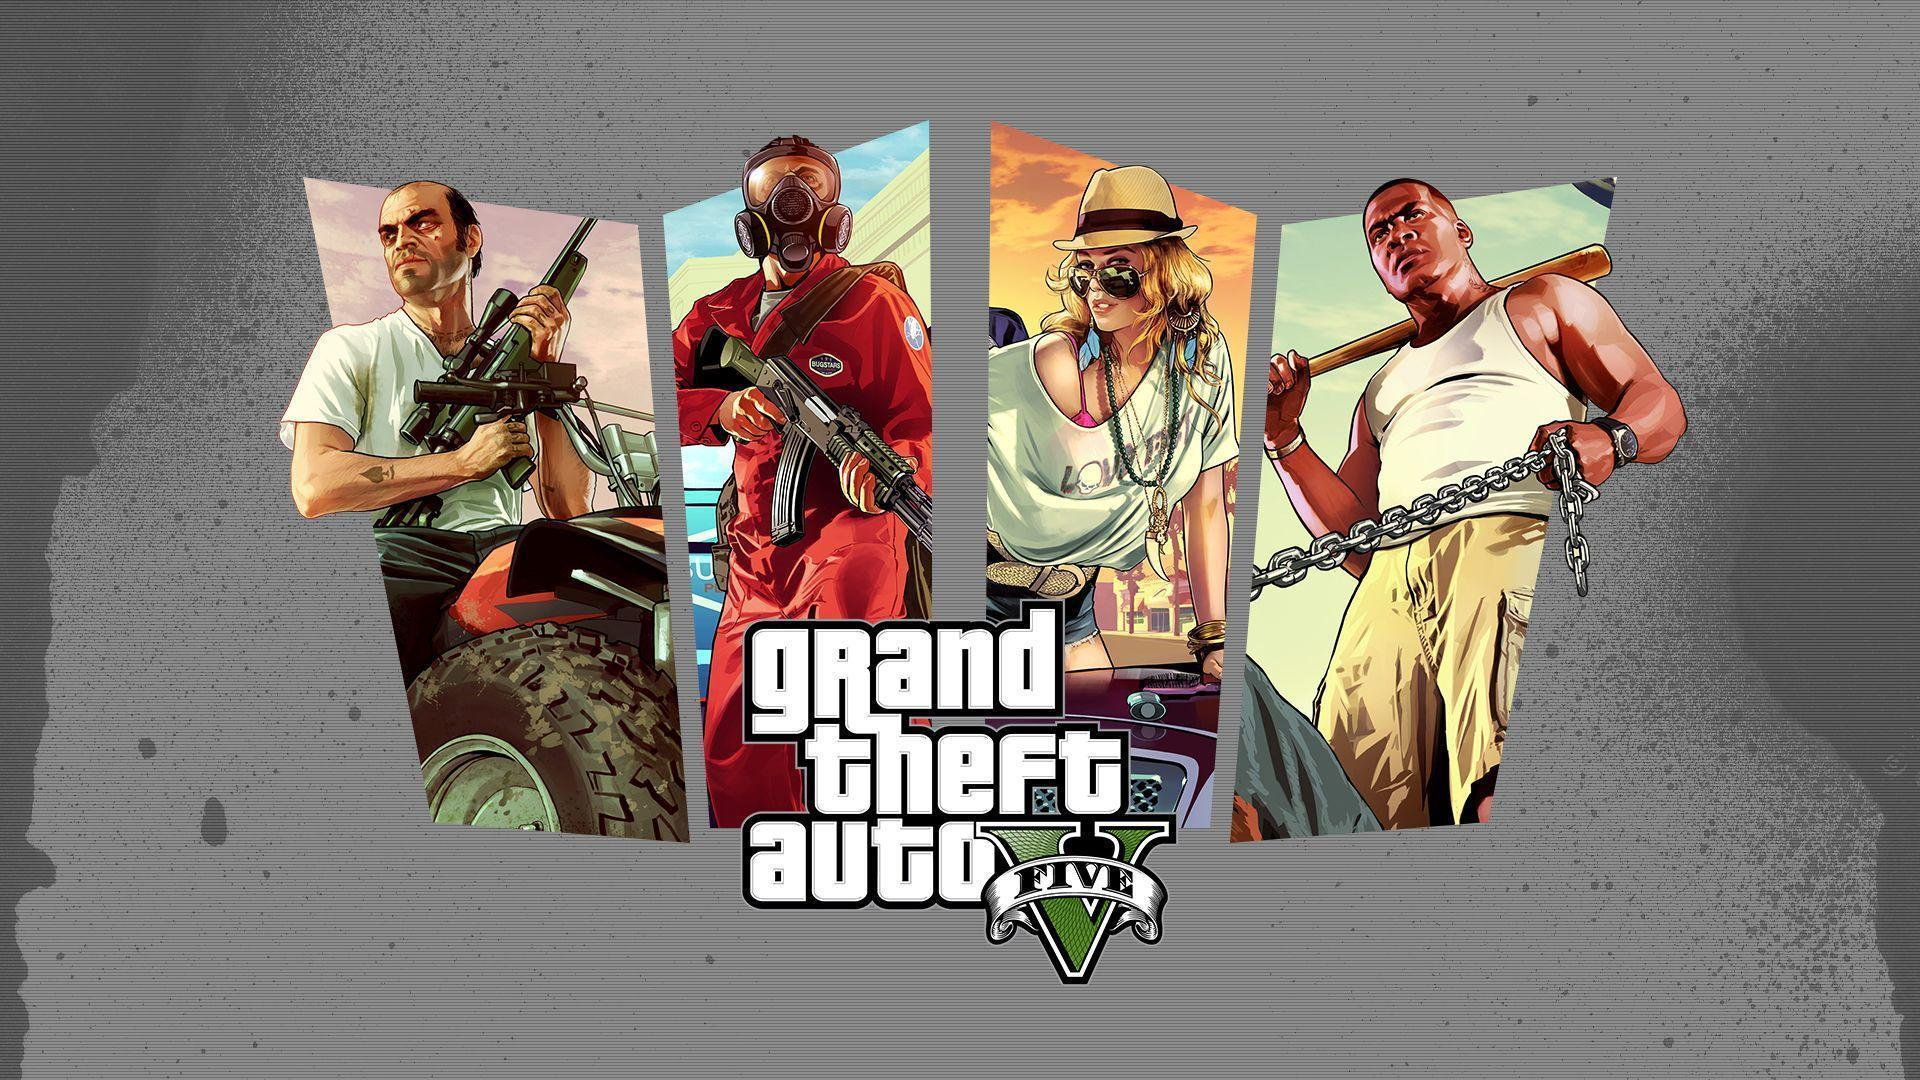 Grand Theft Auto V Wallpapers - Wallpaper Cave